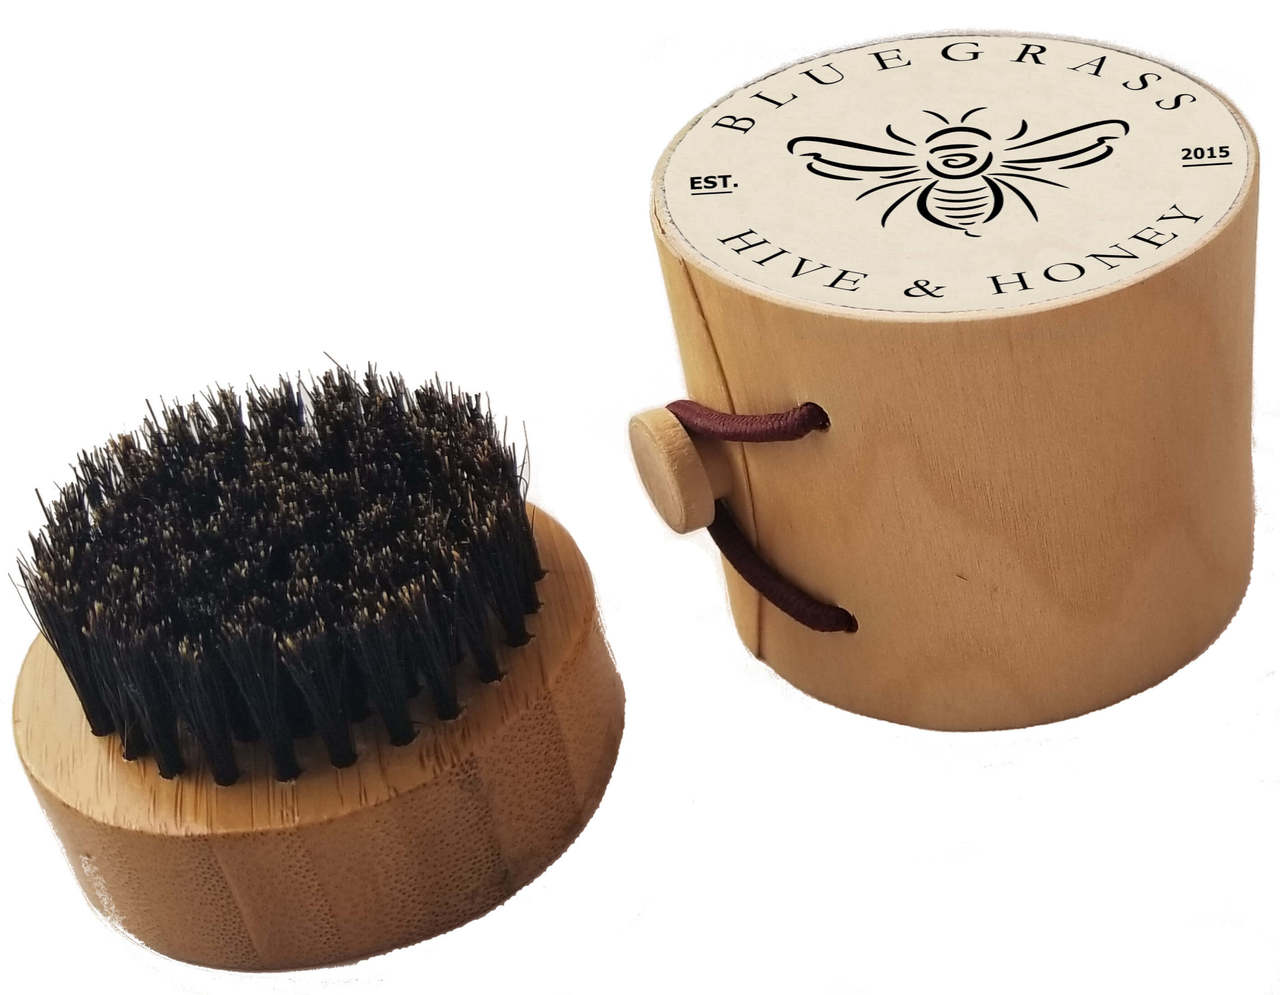 Bamboo Beard Grooming Brush